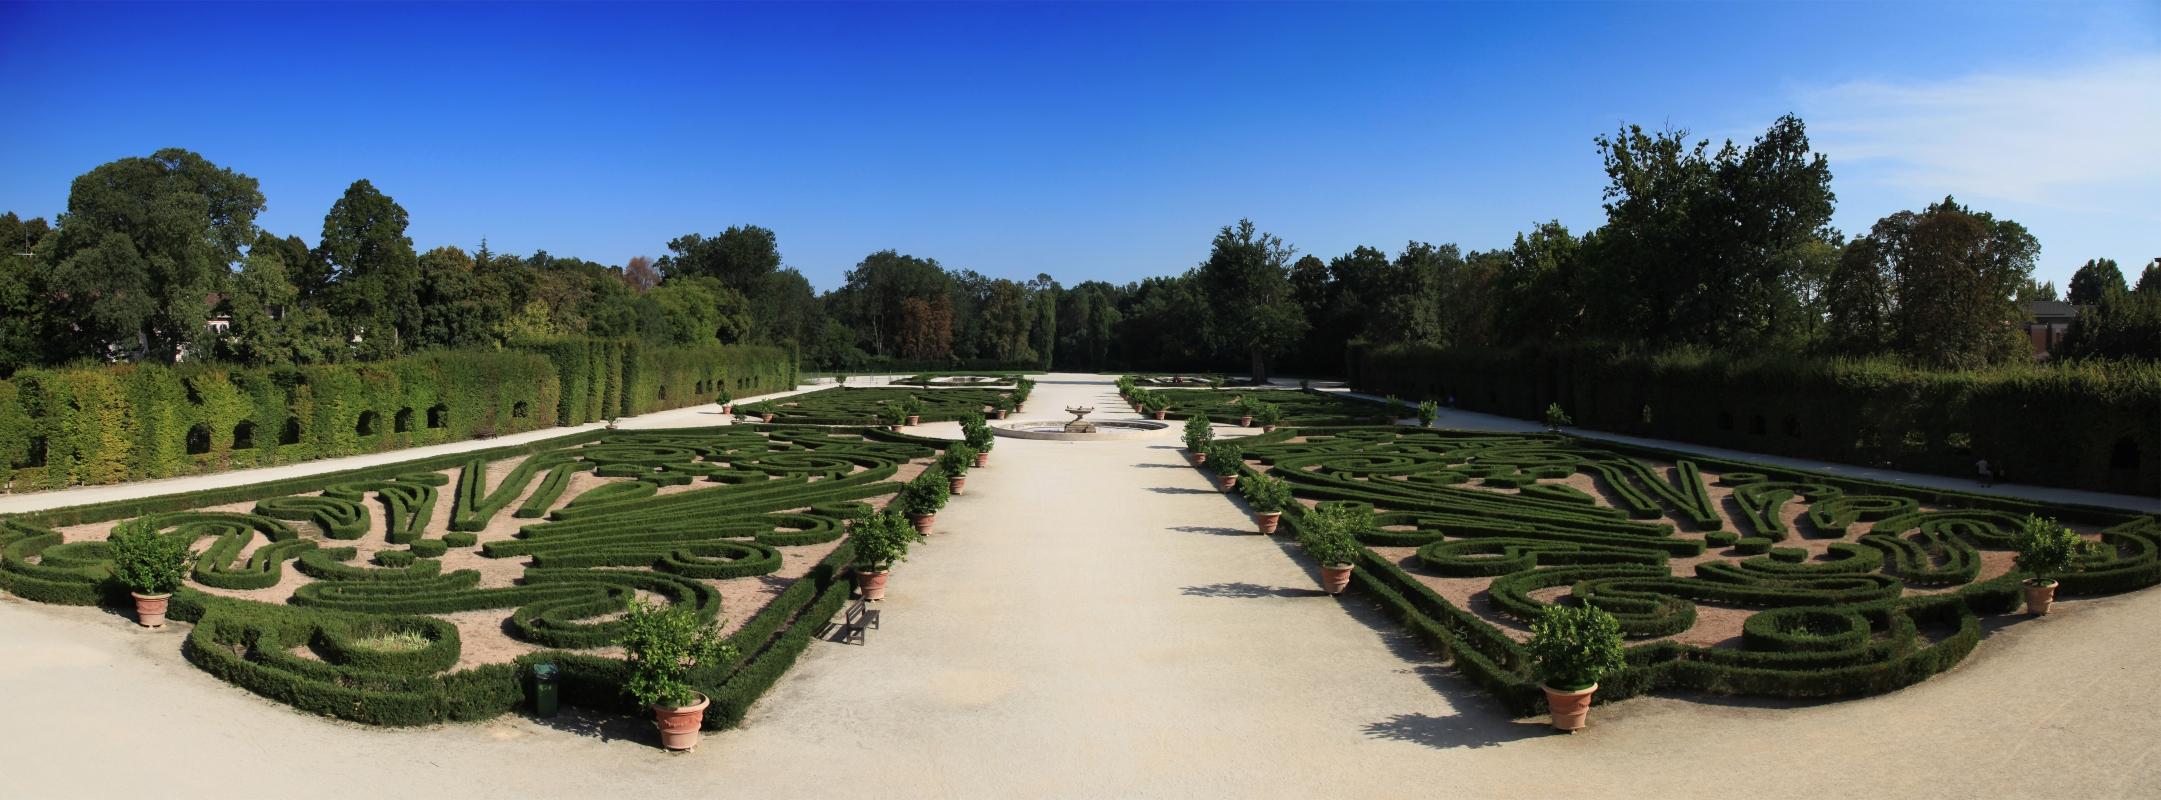 Panoramica del parco - Albertobru - Colorno (PR)